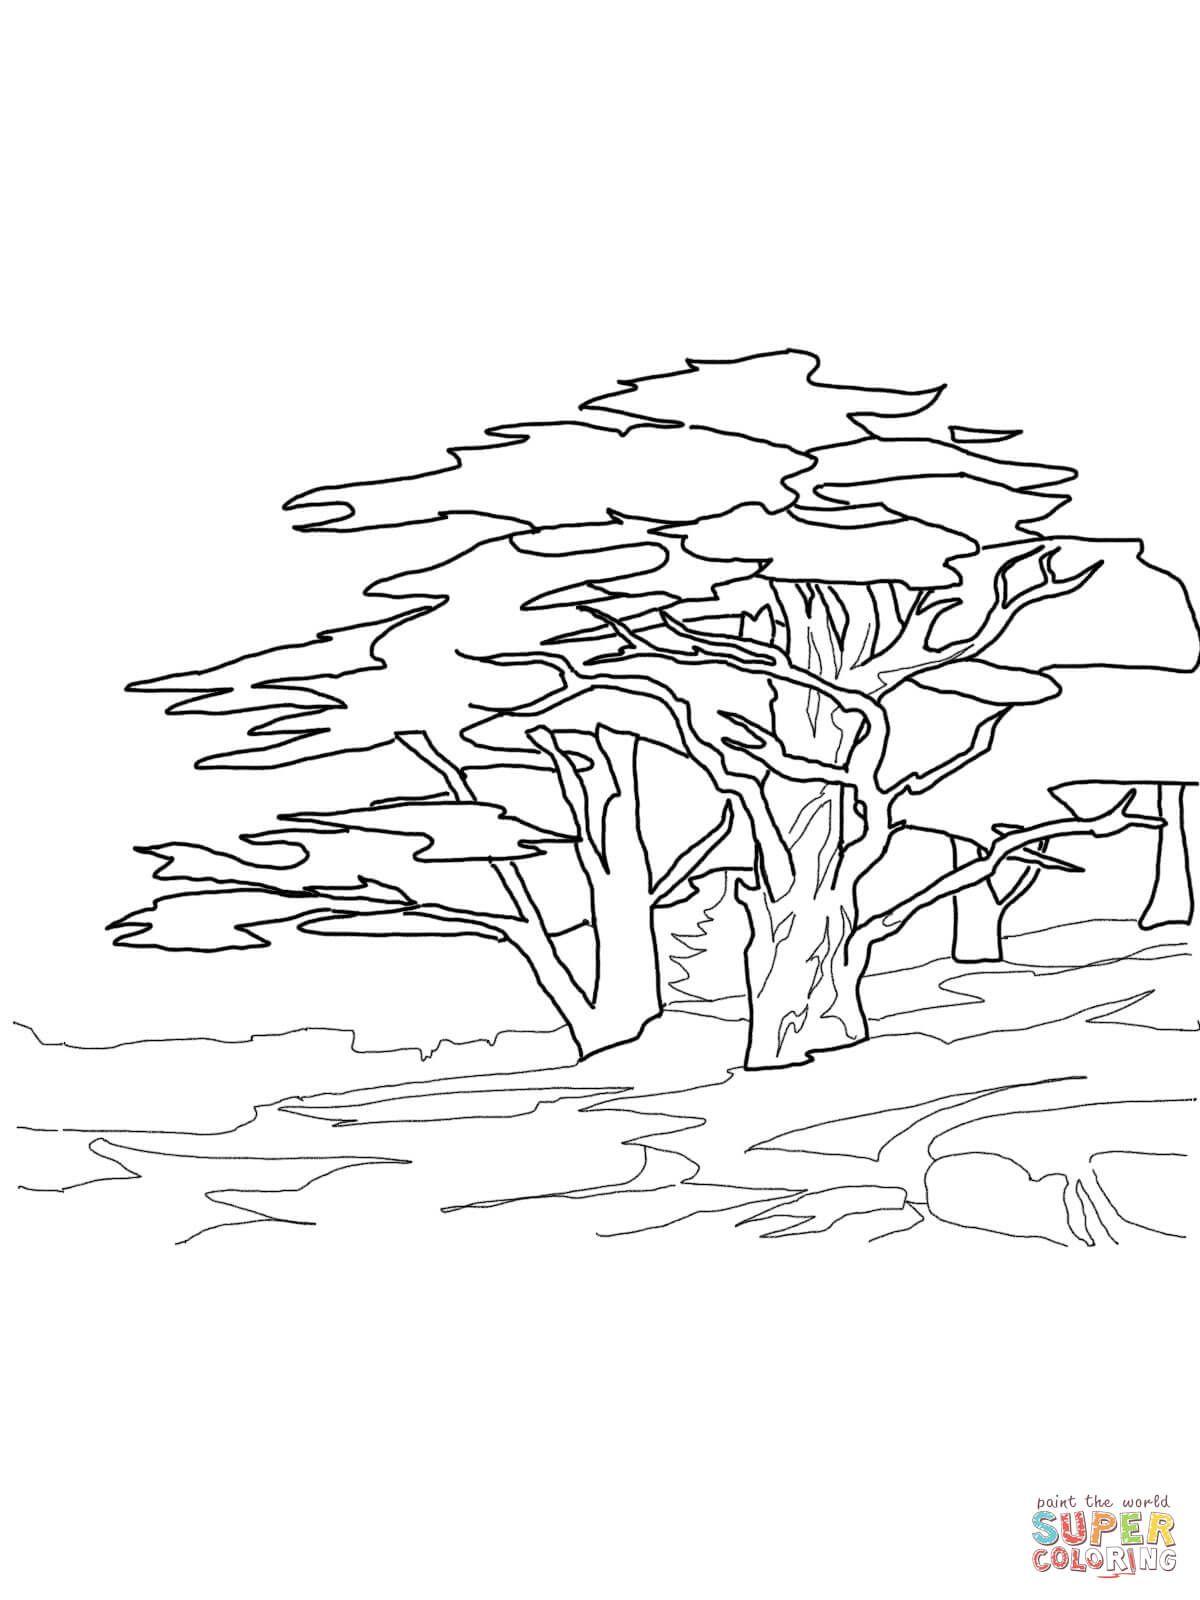 affenbrotbaum ausmalbilder #affenbrotbaum #ausmalbilder in